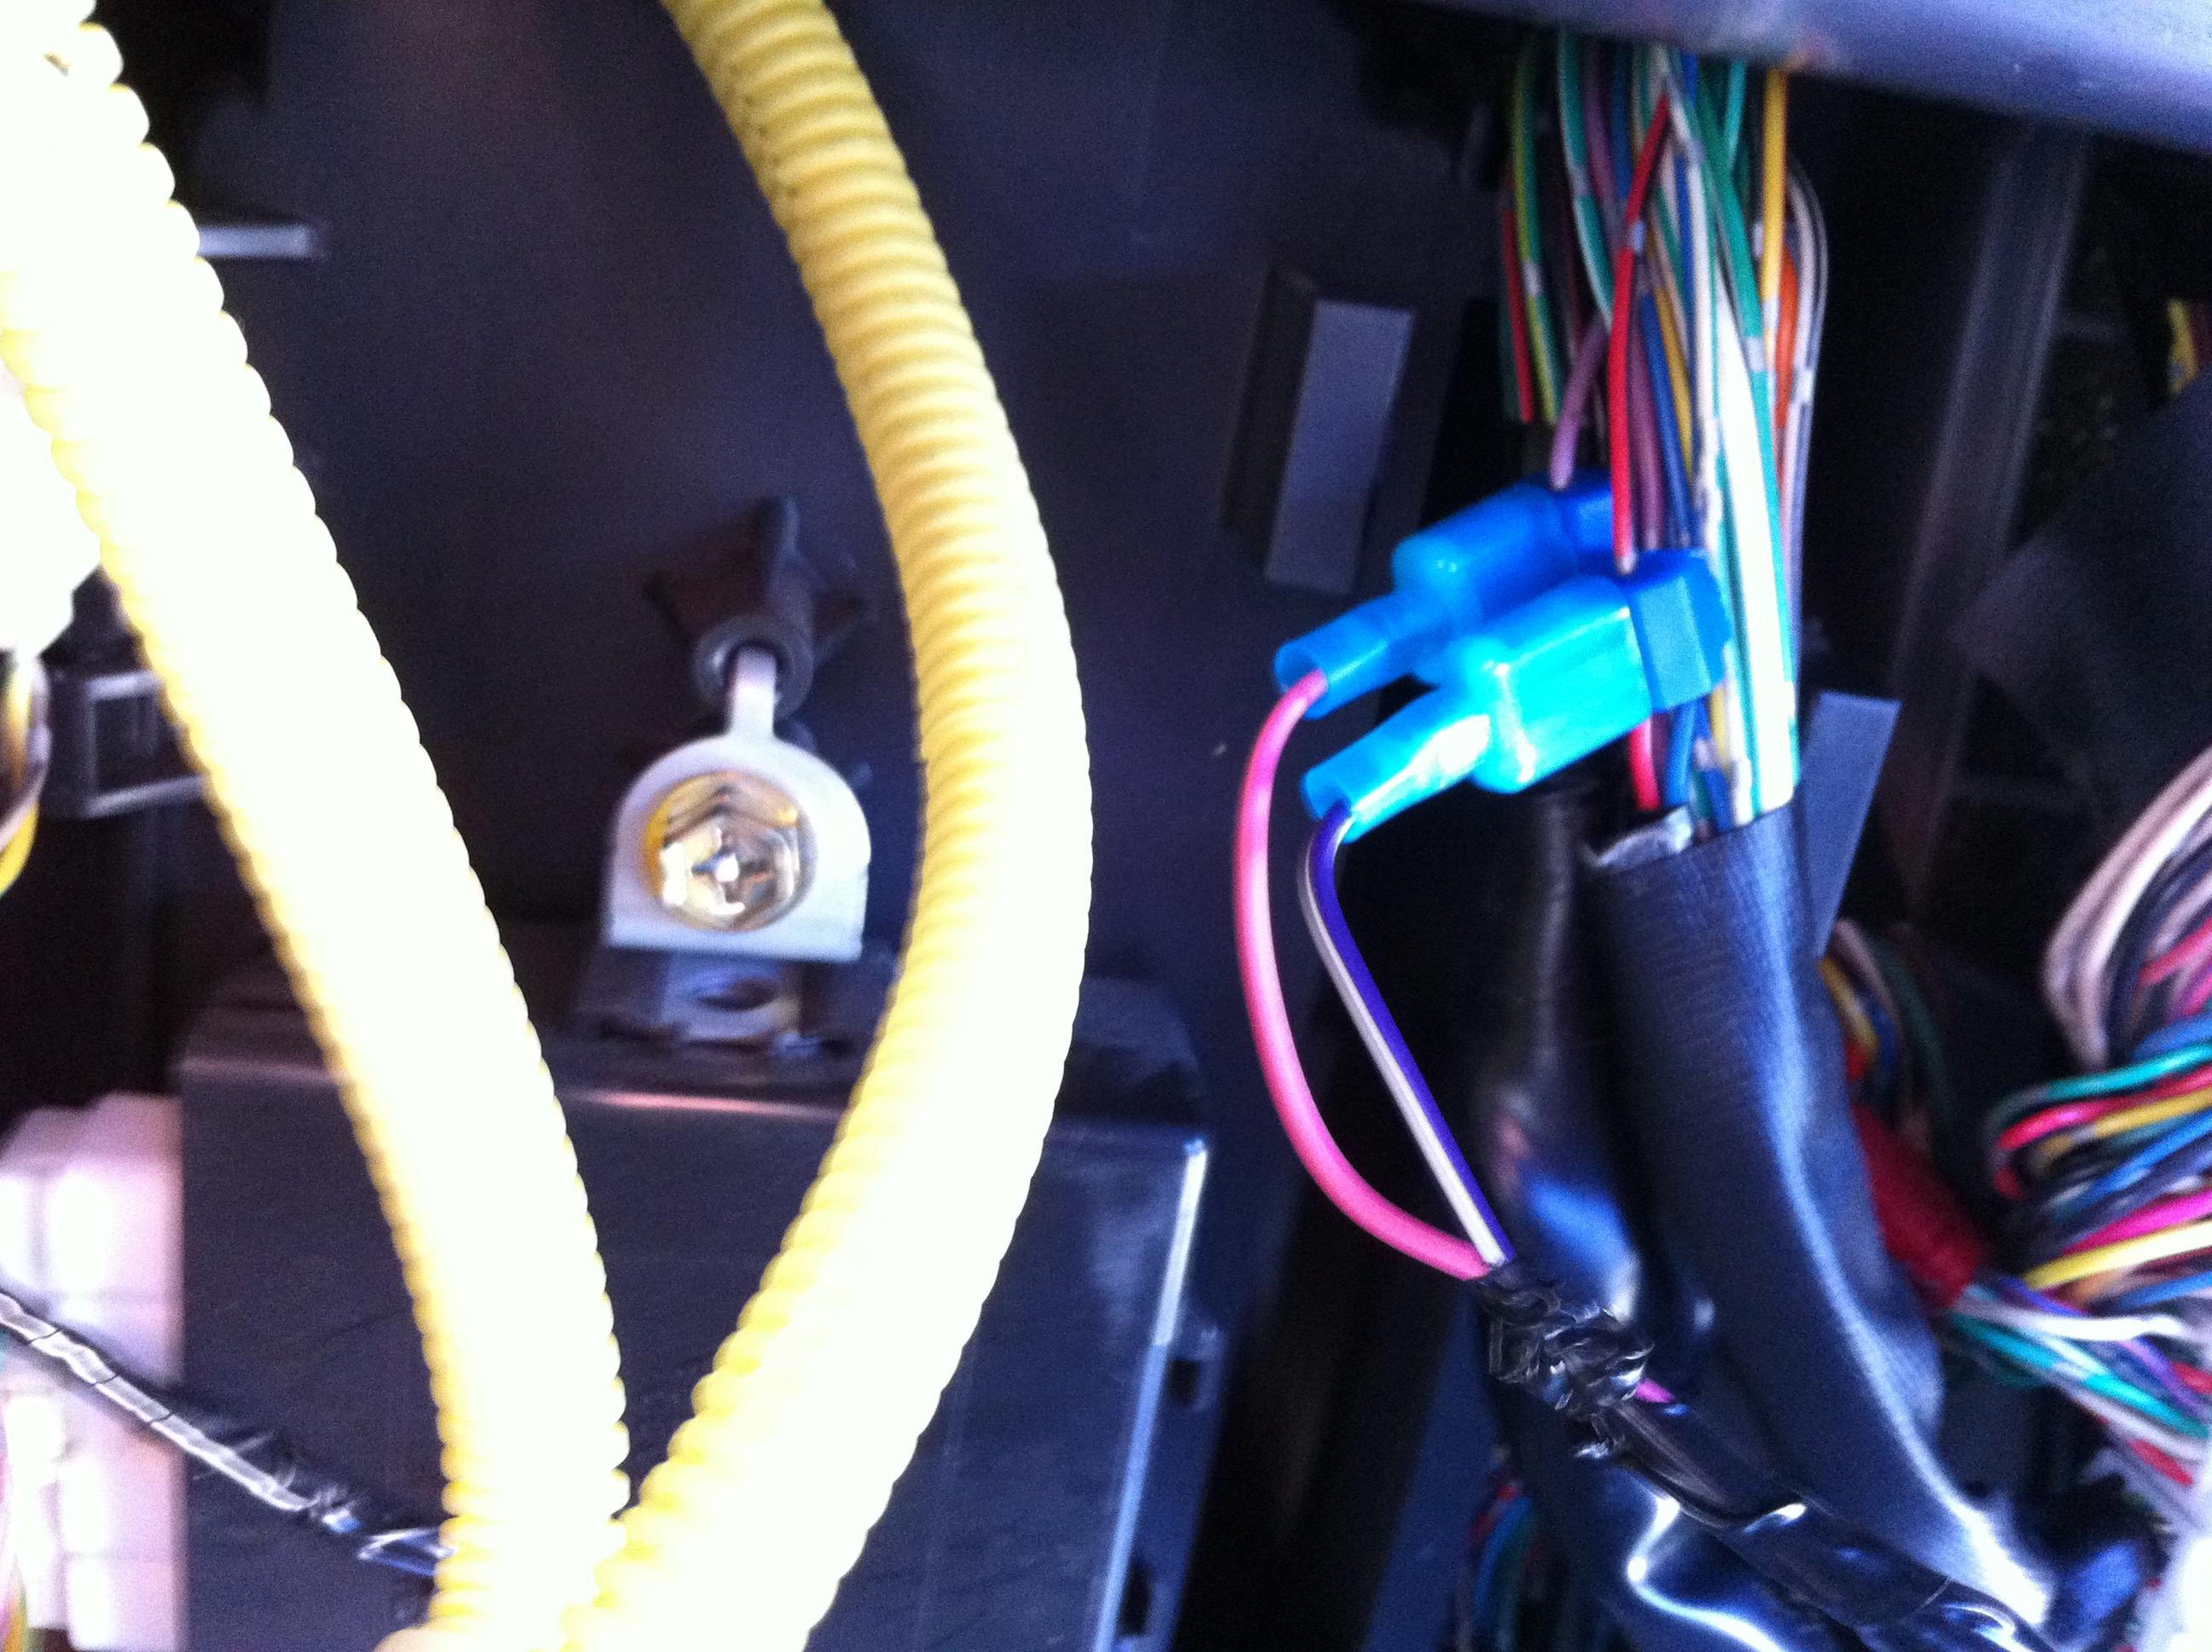 1998 land cruiser radio wiring diagram double pole single throw switch stereo lx 470 02 tlc faq